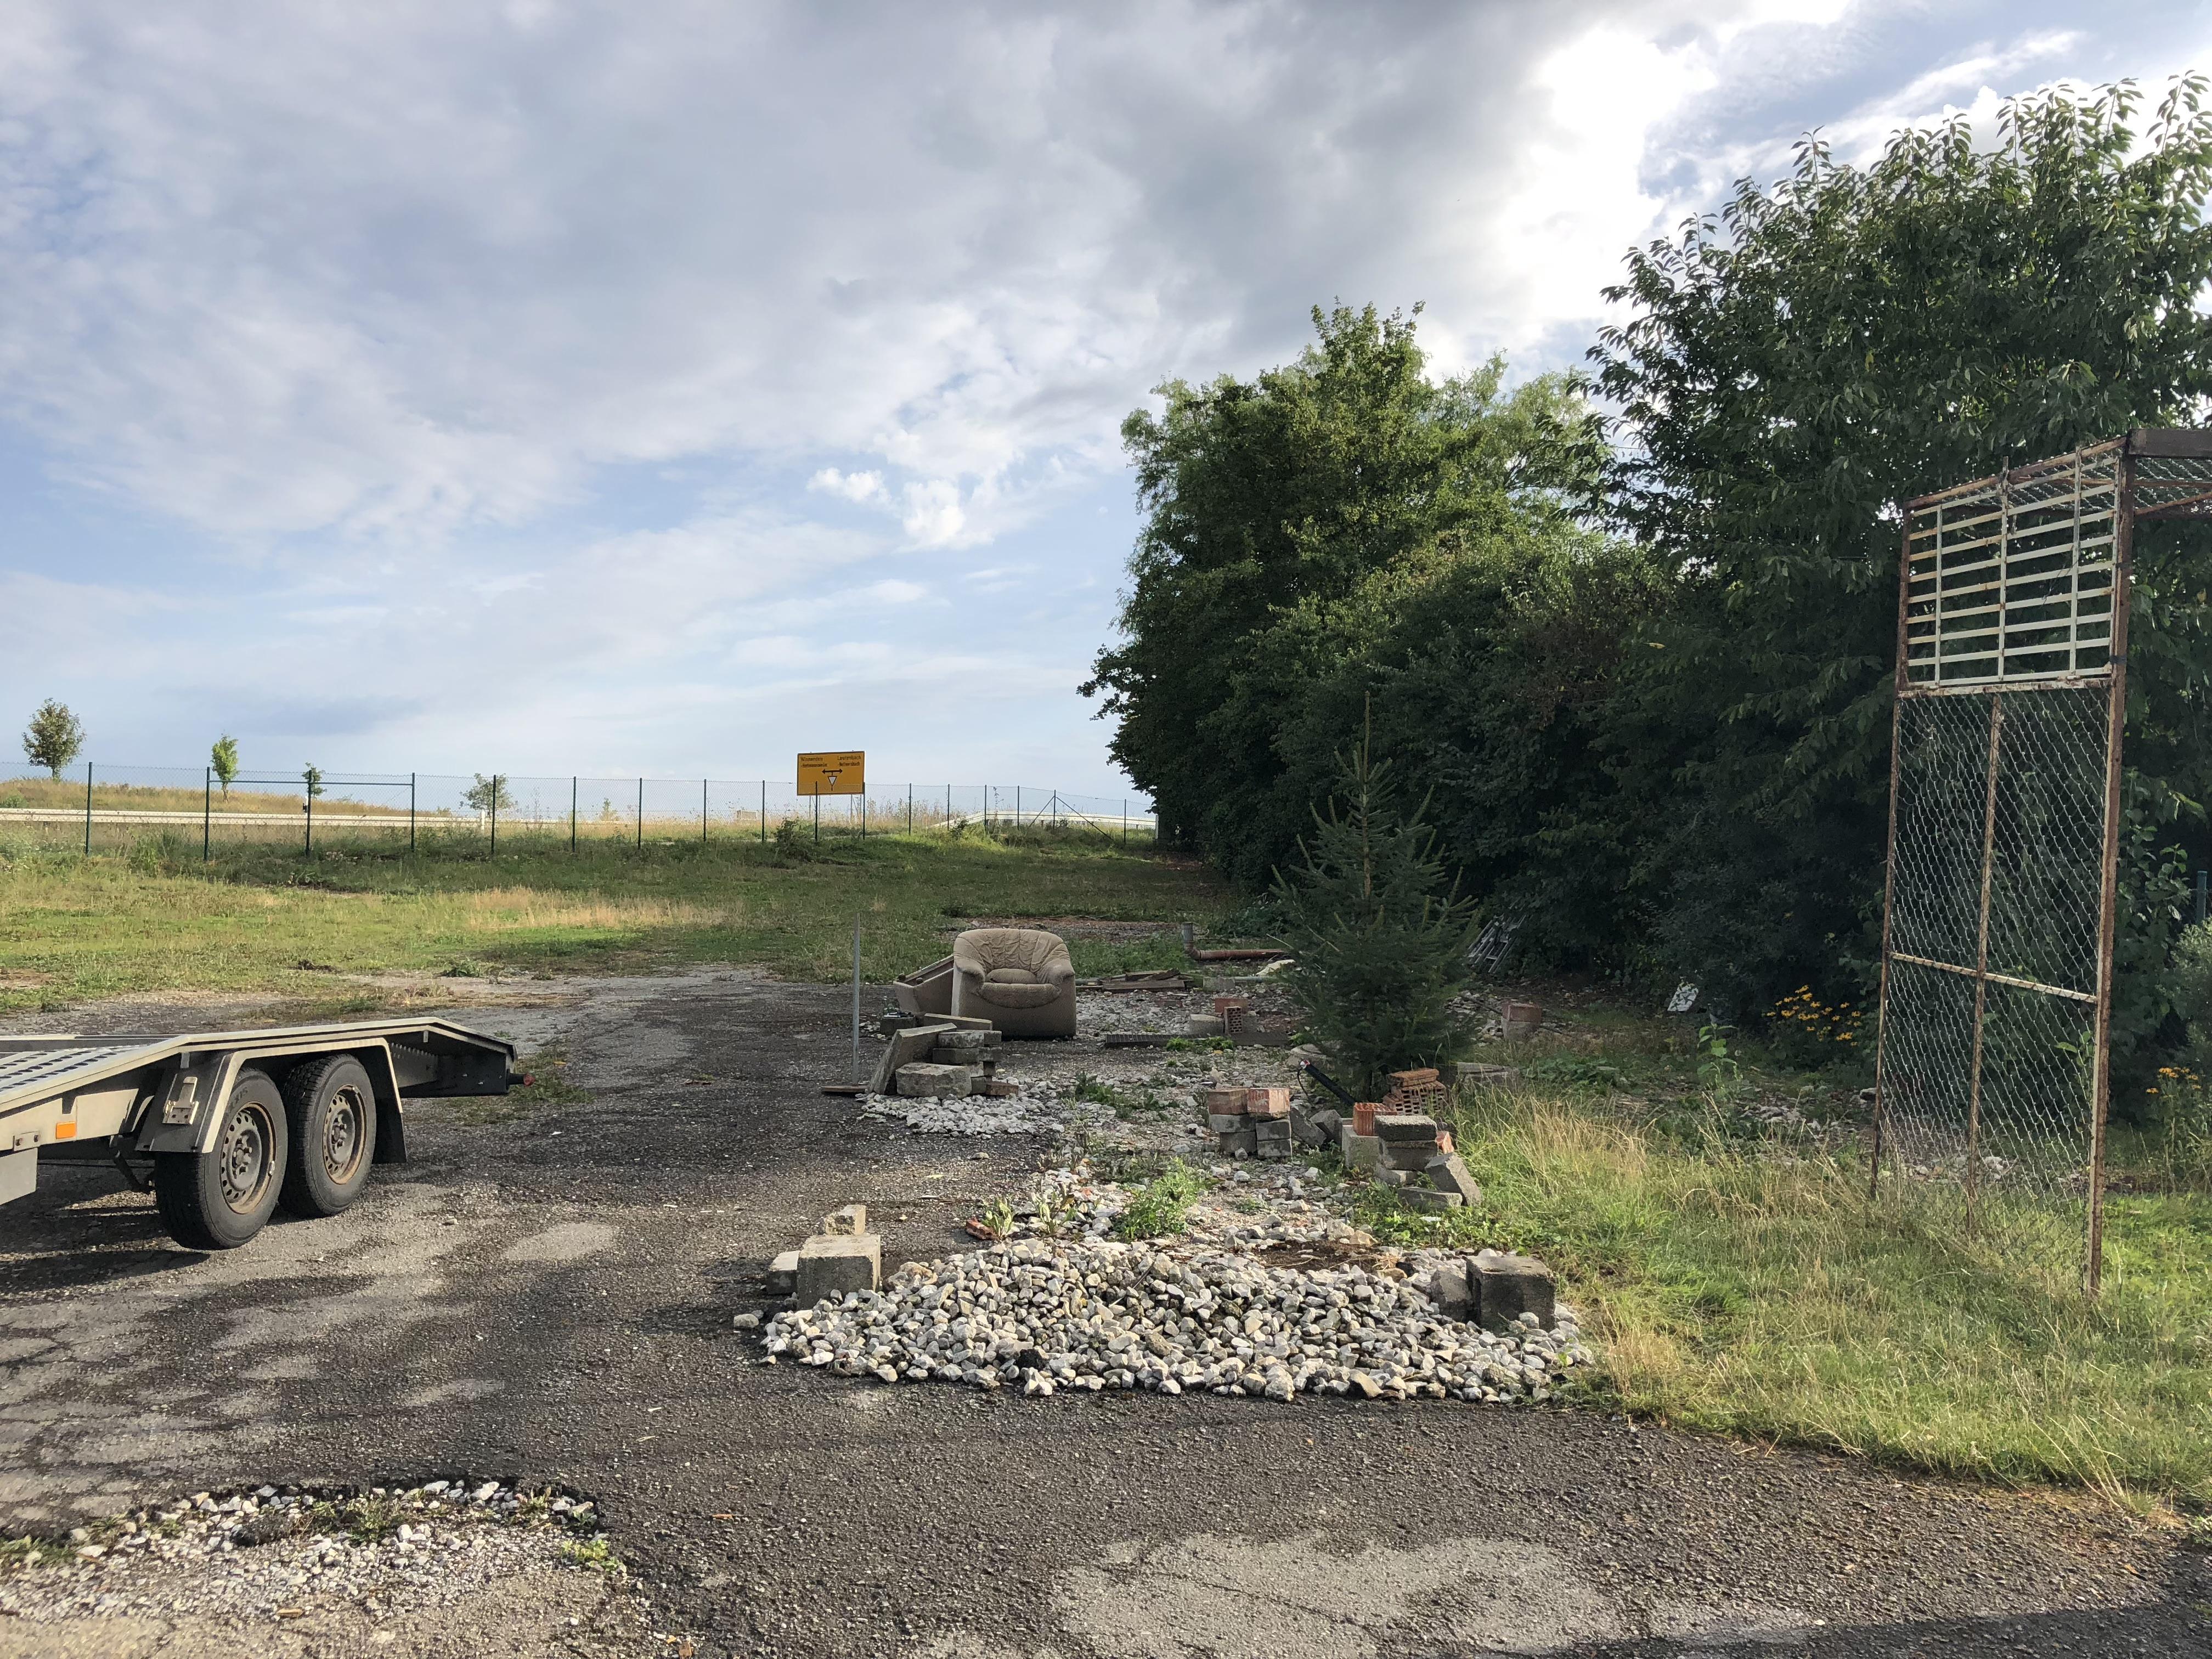 2018-08-09 Grundstück leer (1)